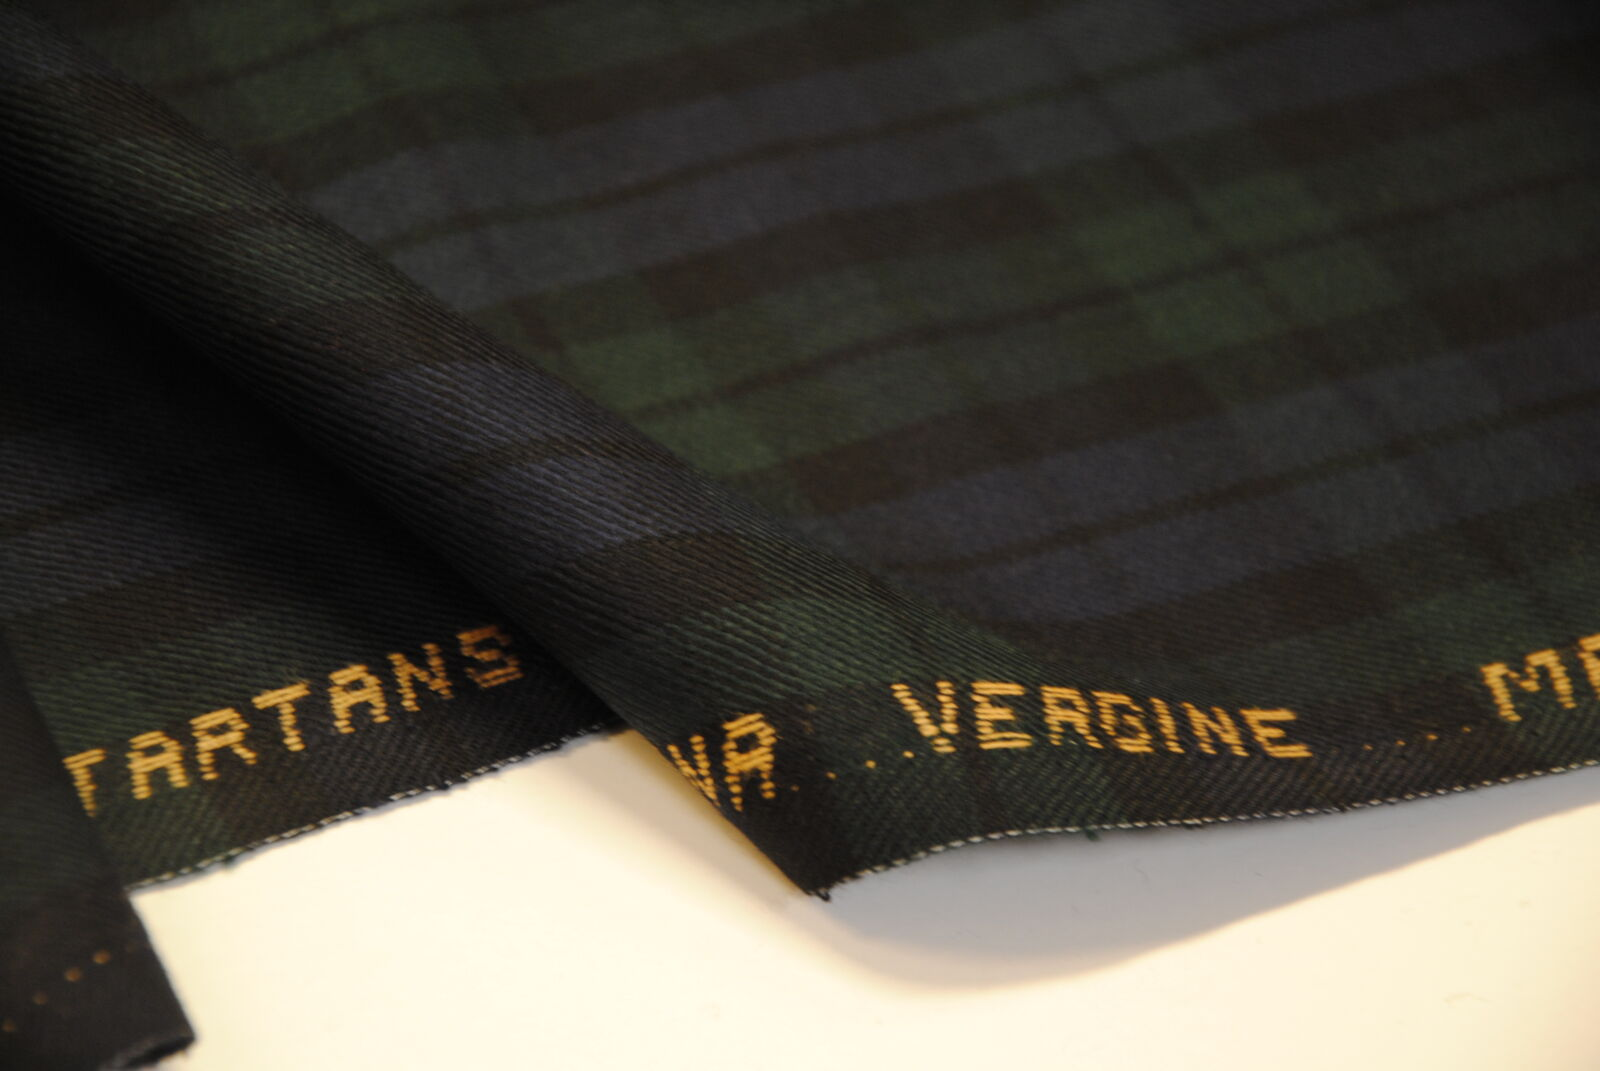 tartan1 3 Kilt   Scozzese made in Italy LANA VERGINE